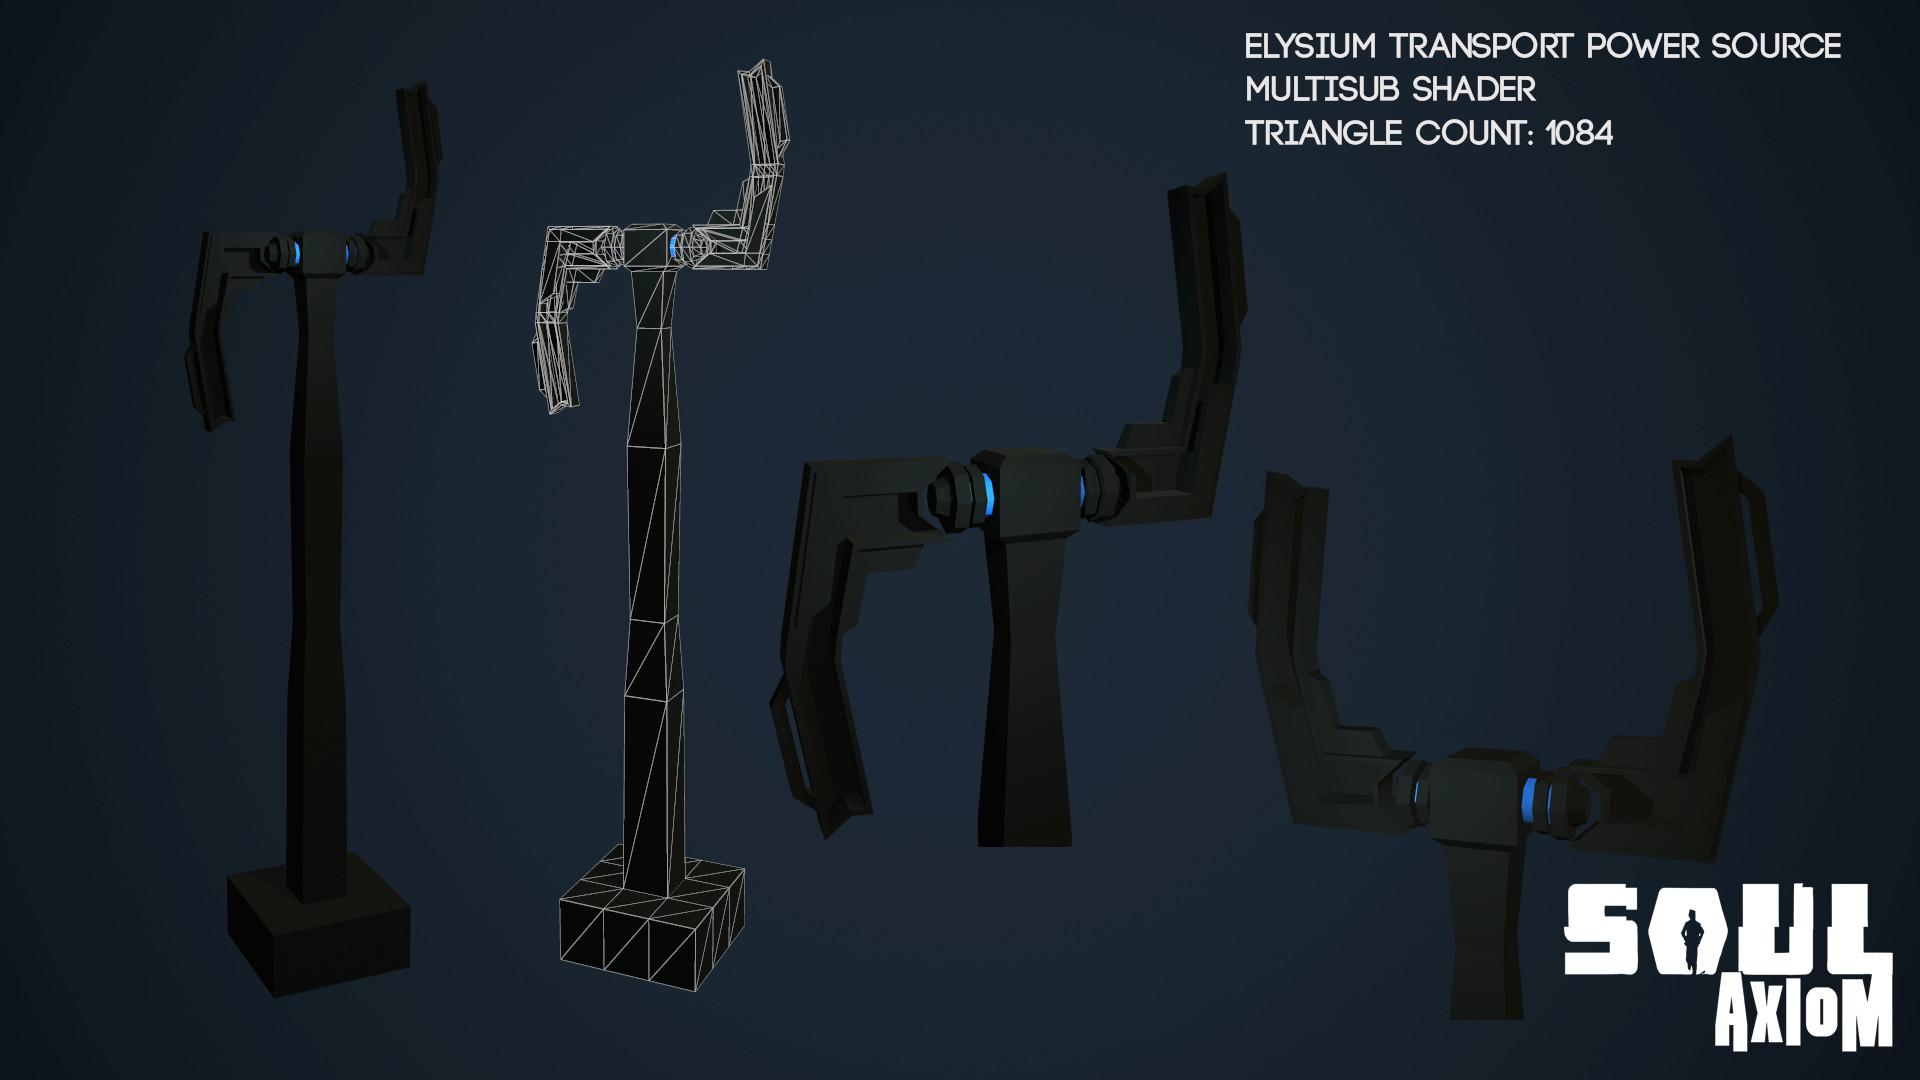 Martin giles elysium transport power source